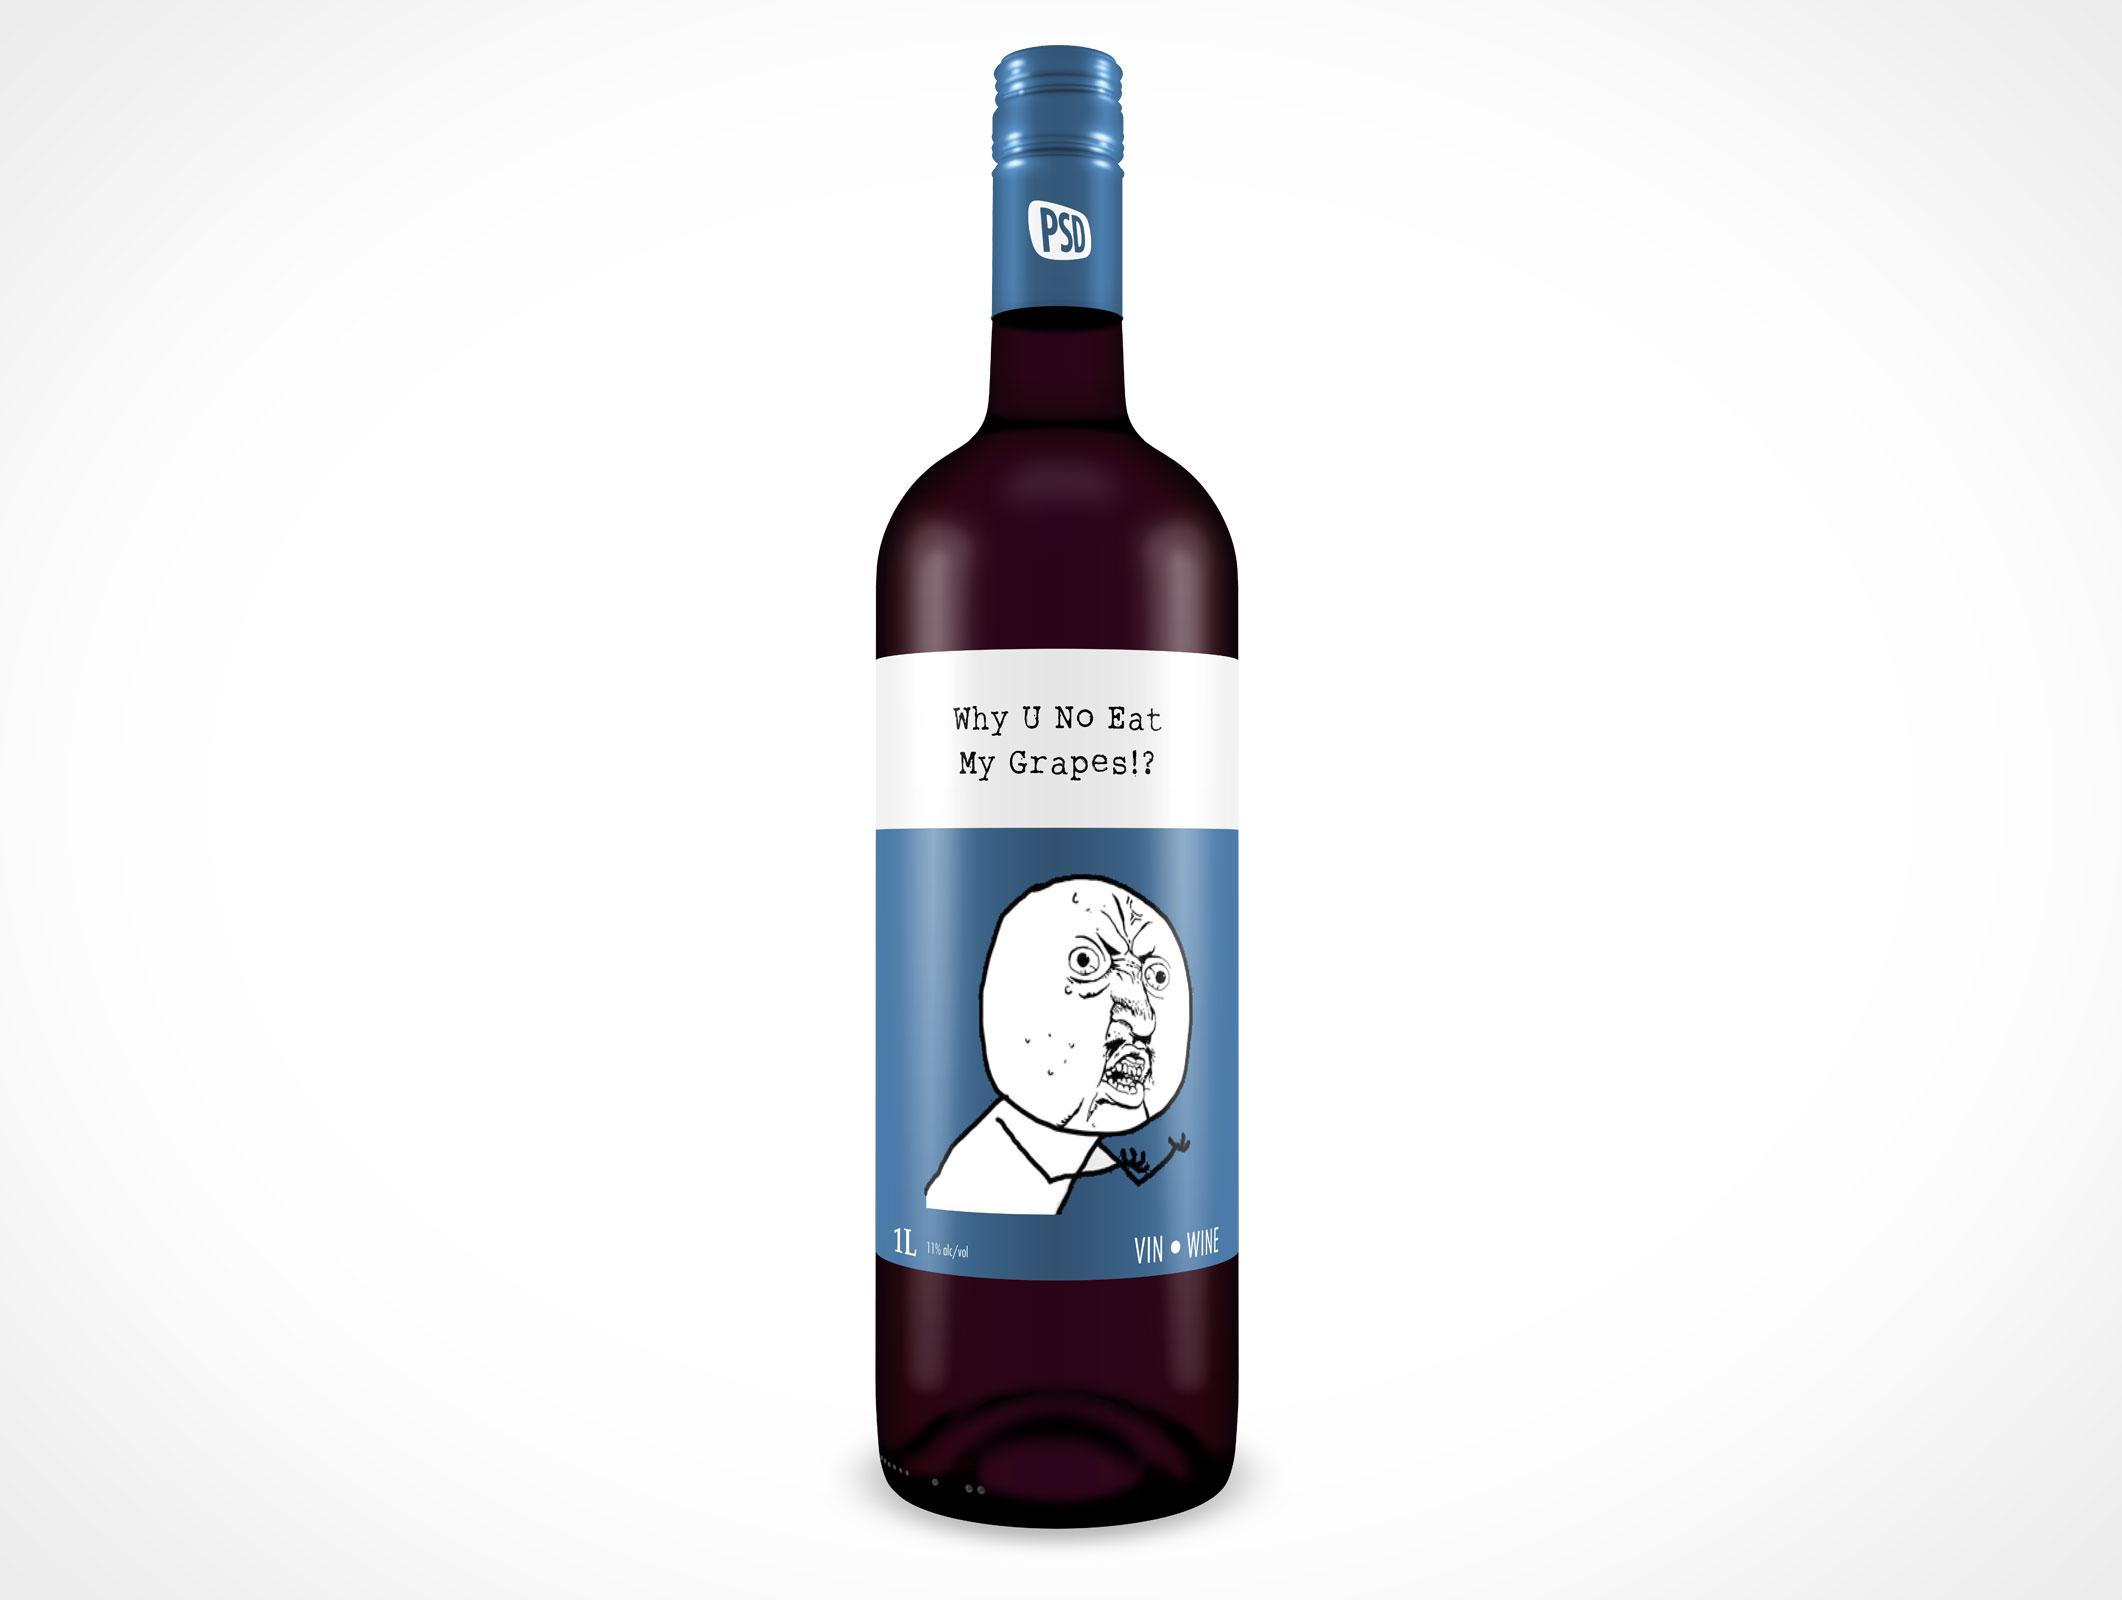 12 PSD Liquor Bottles Images